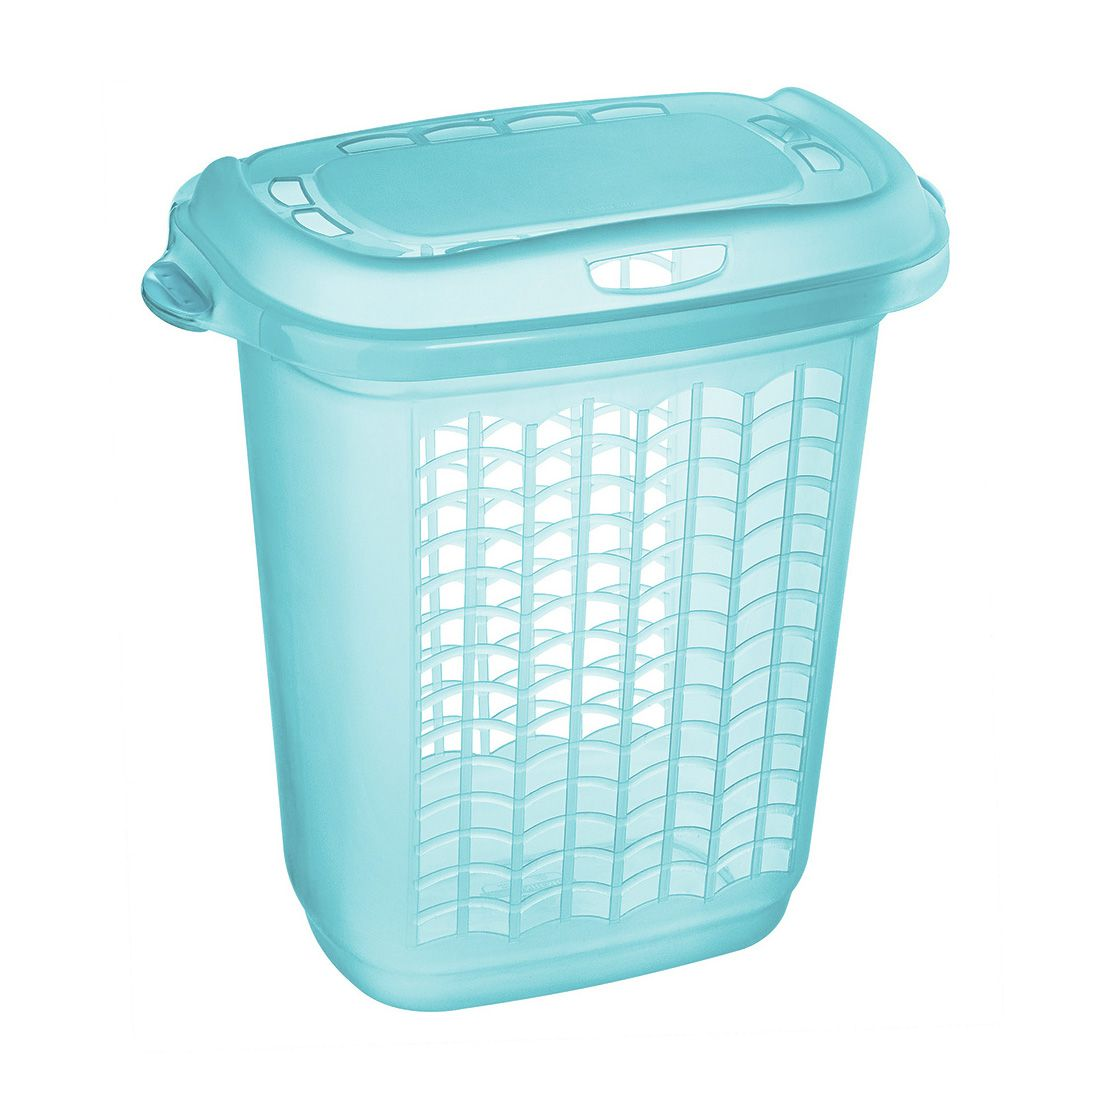 Roupeiro de Plástico Sanremo 46,4L Azul Tiffany